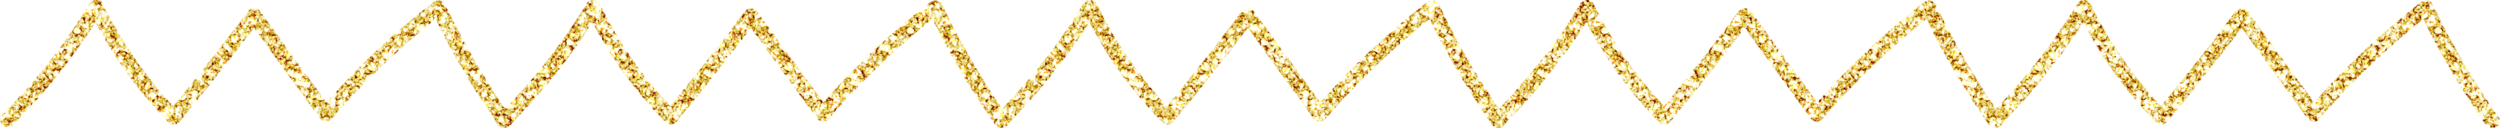 goldglitterborder01.png